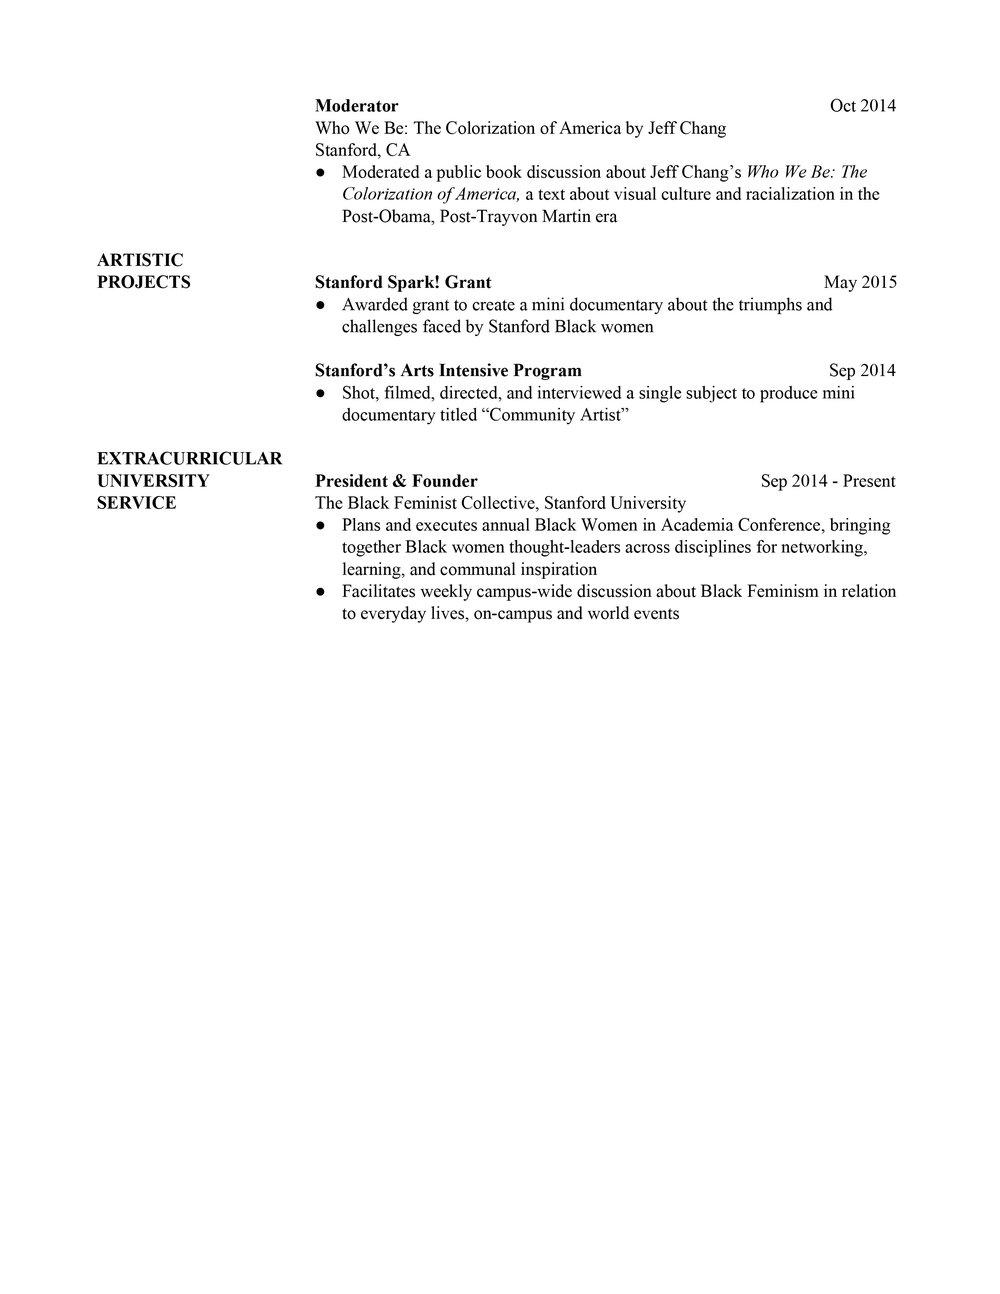 CurriculumVitae-Mysia-4.jpg